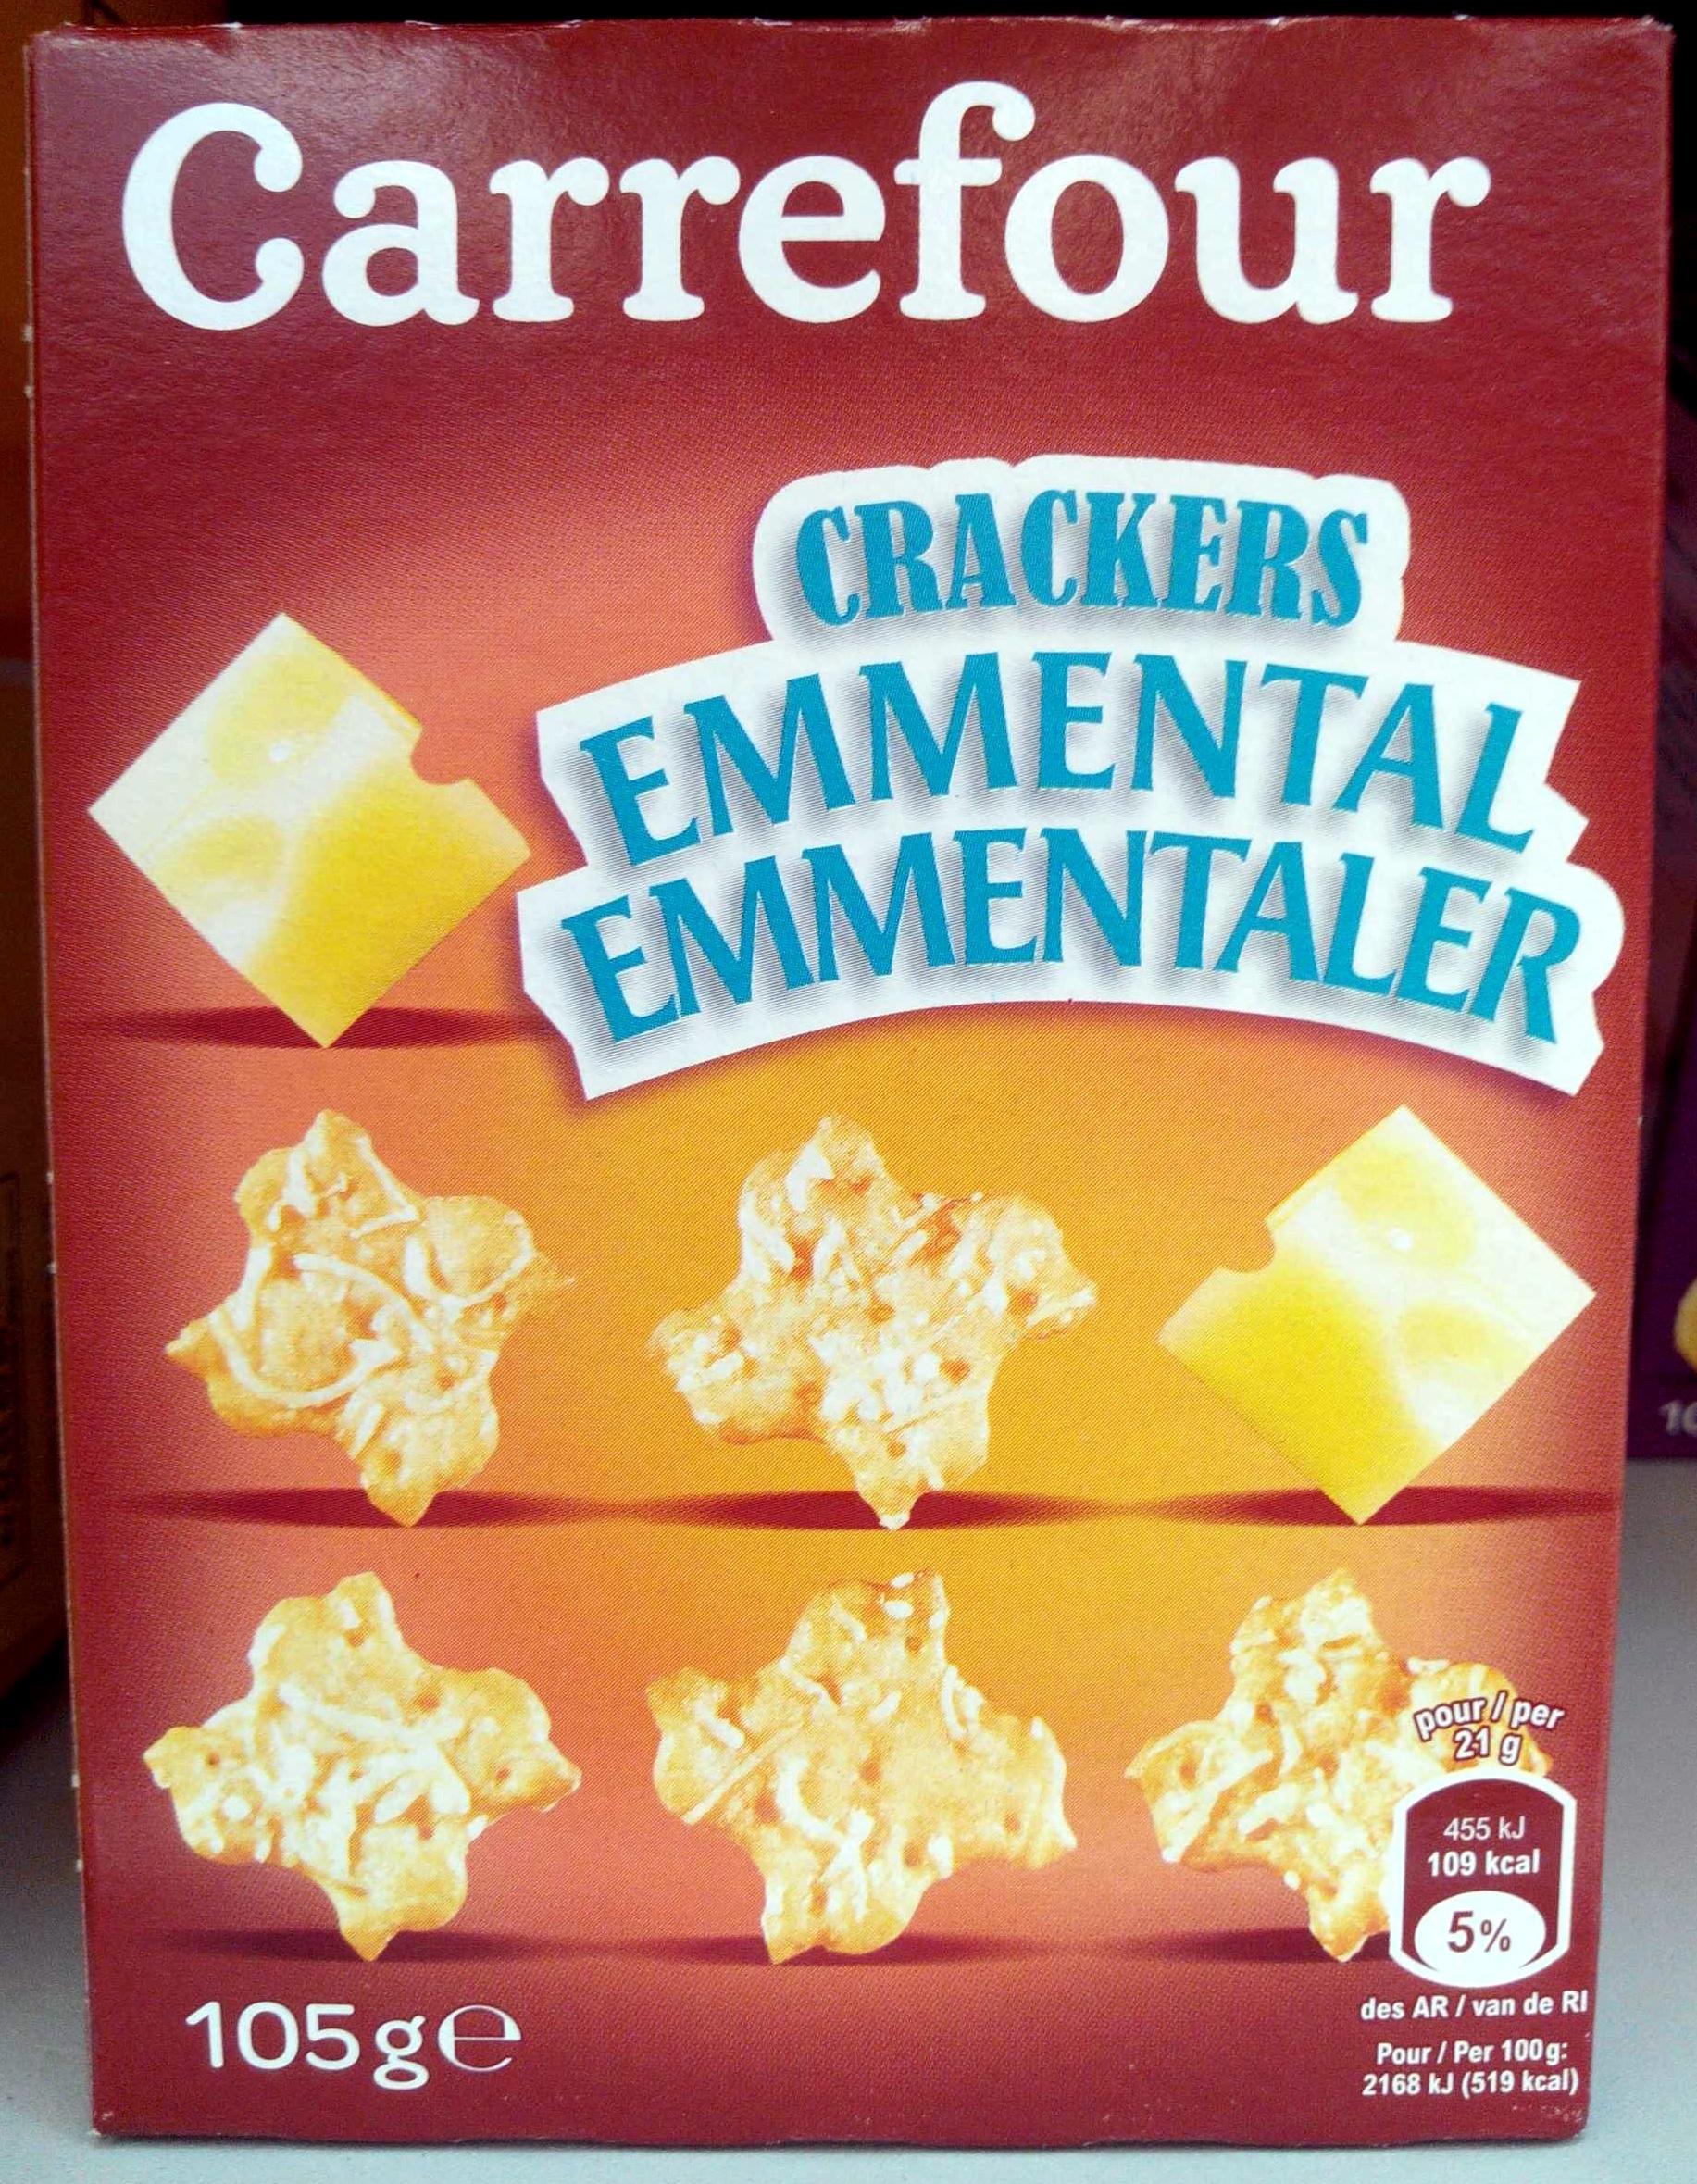 Crackers Emmental - Product - fr